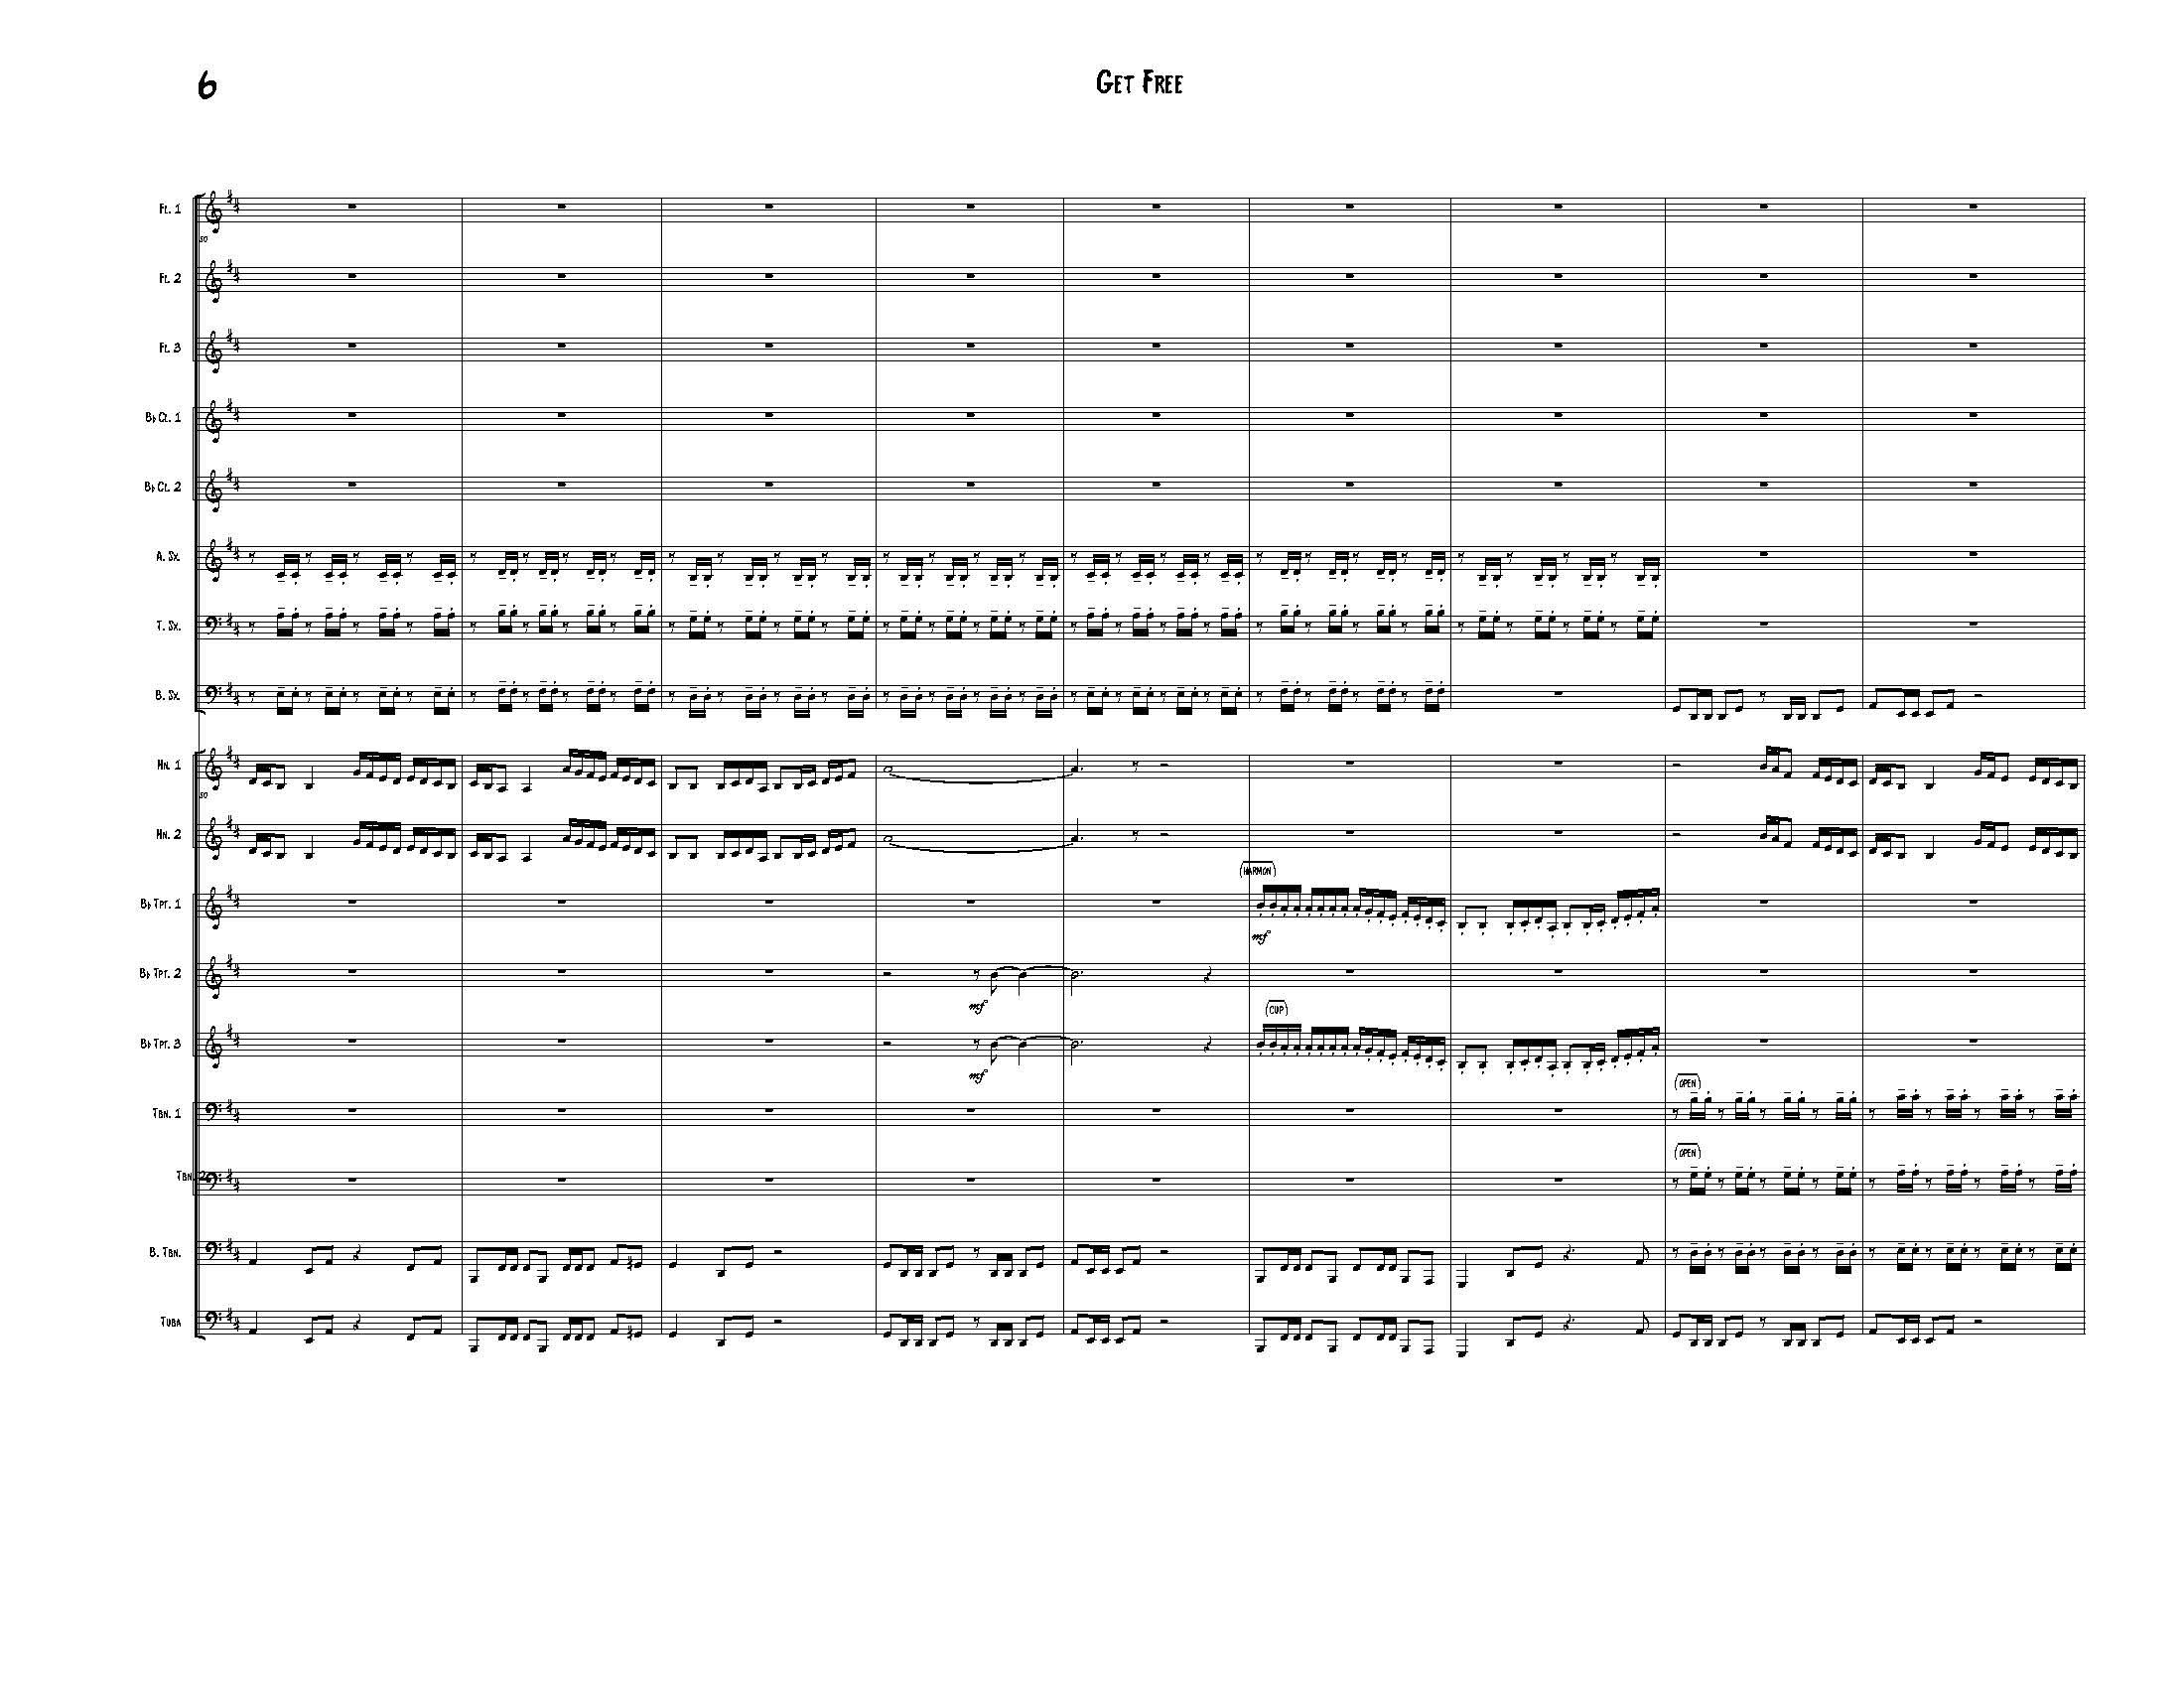 Get Free BKLYN 1834 Score_Page_06.jpg